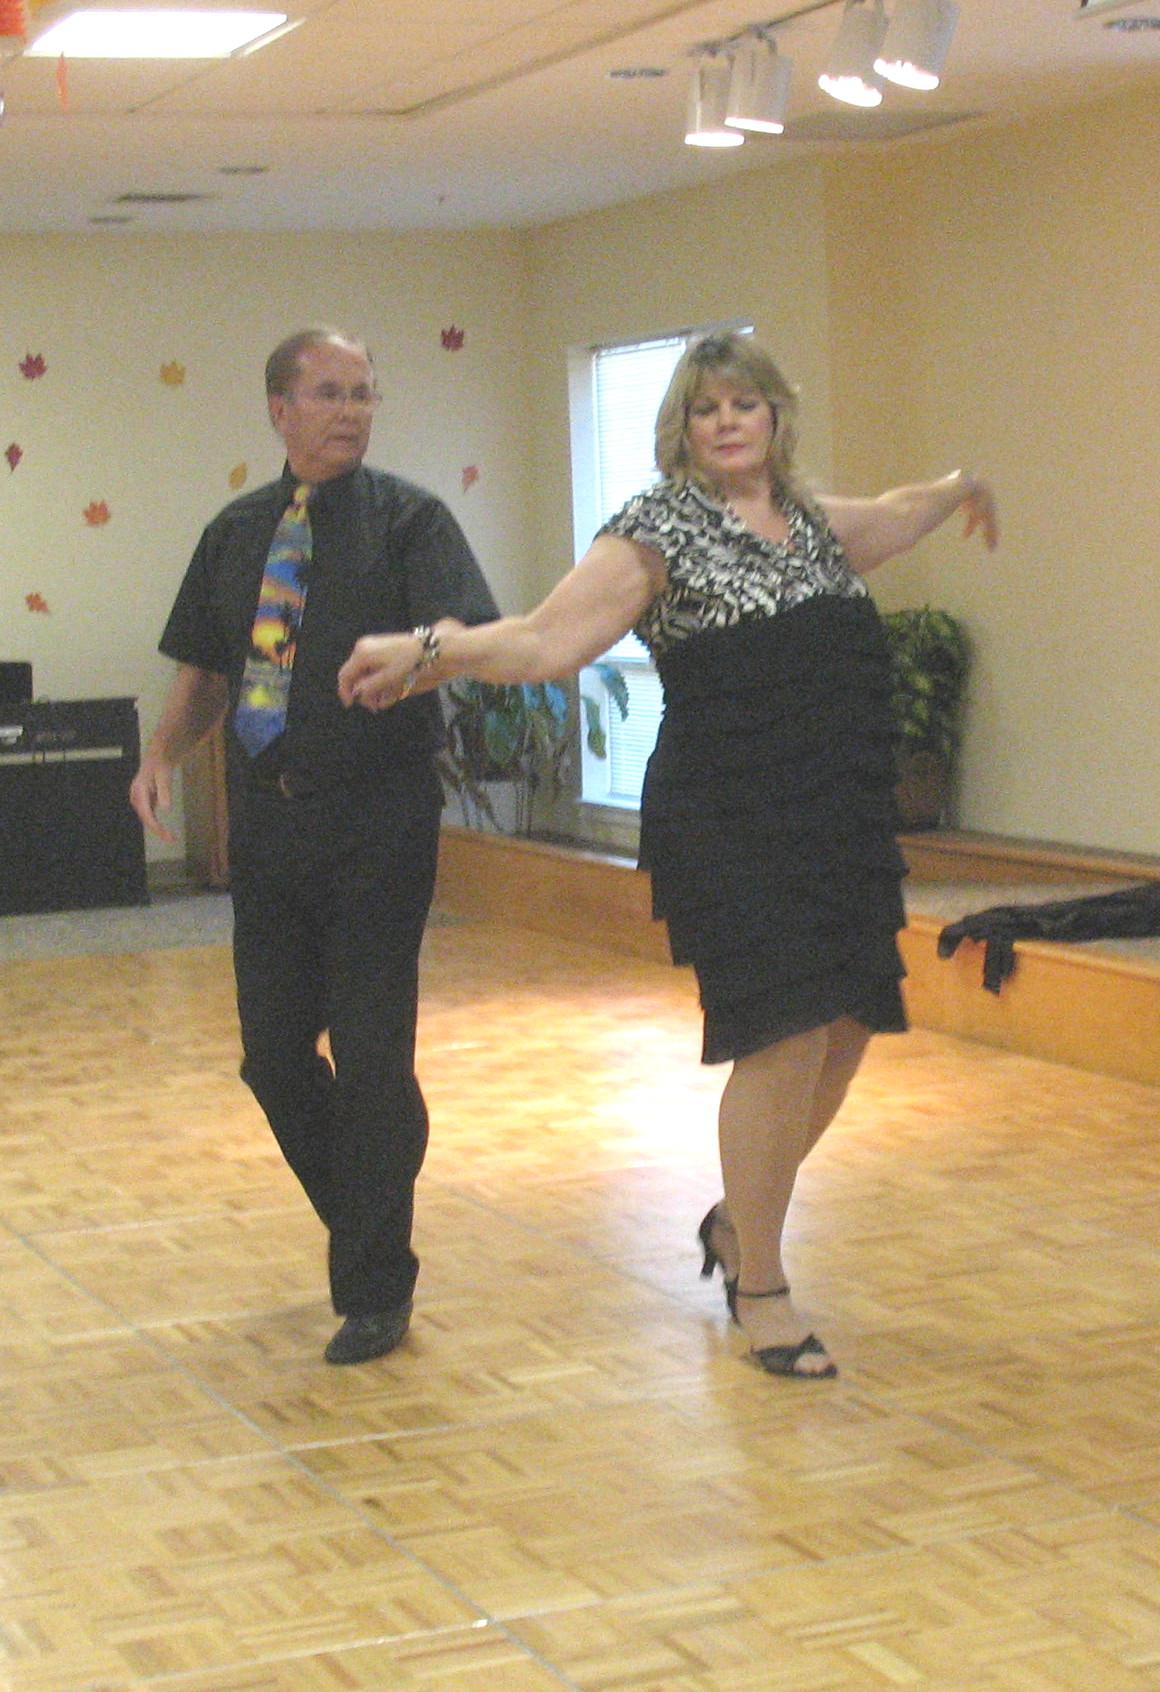 Sharon & Tim Nov 15